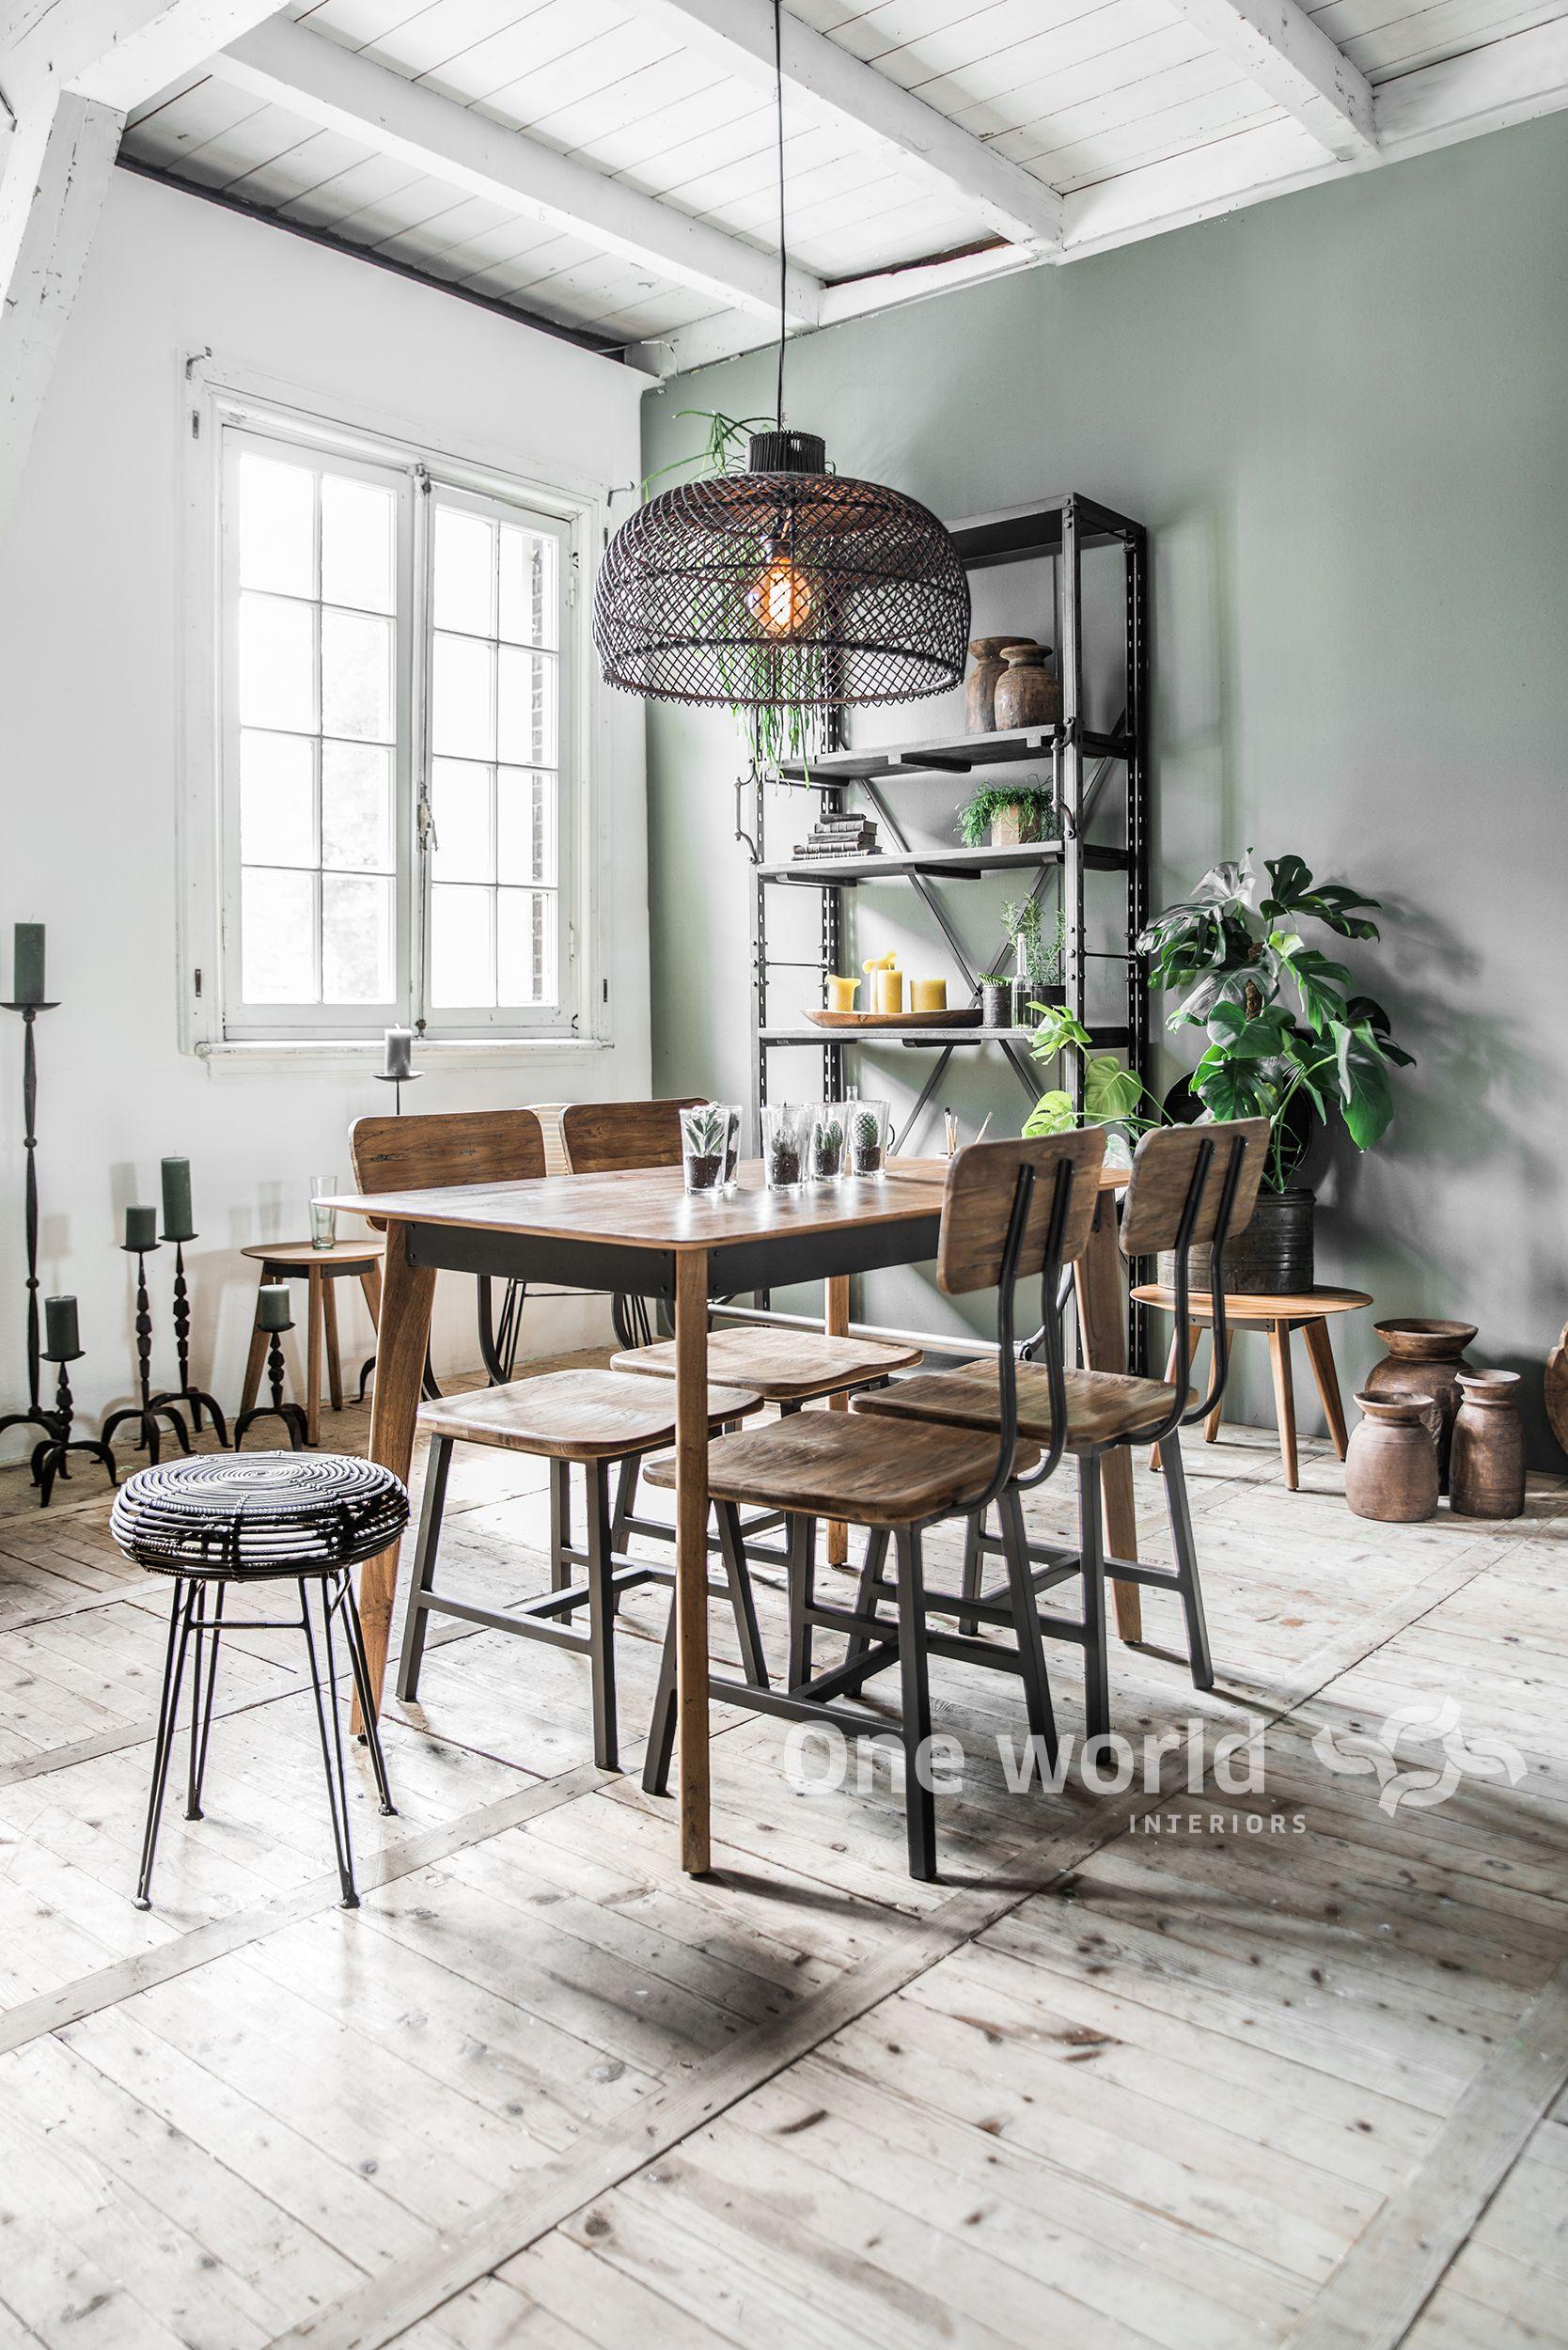 One World Interiors   Hardware Store U0026 Craftsman Collection   Picture:  Paulina Arcklin